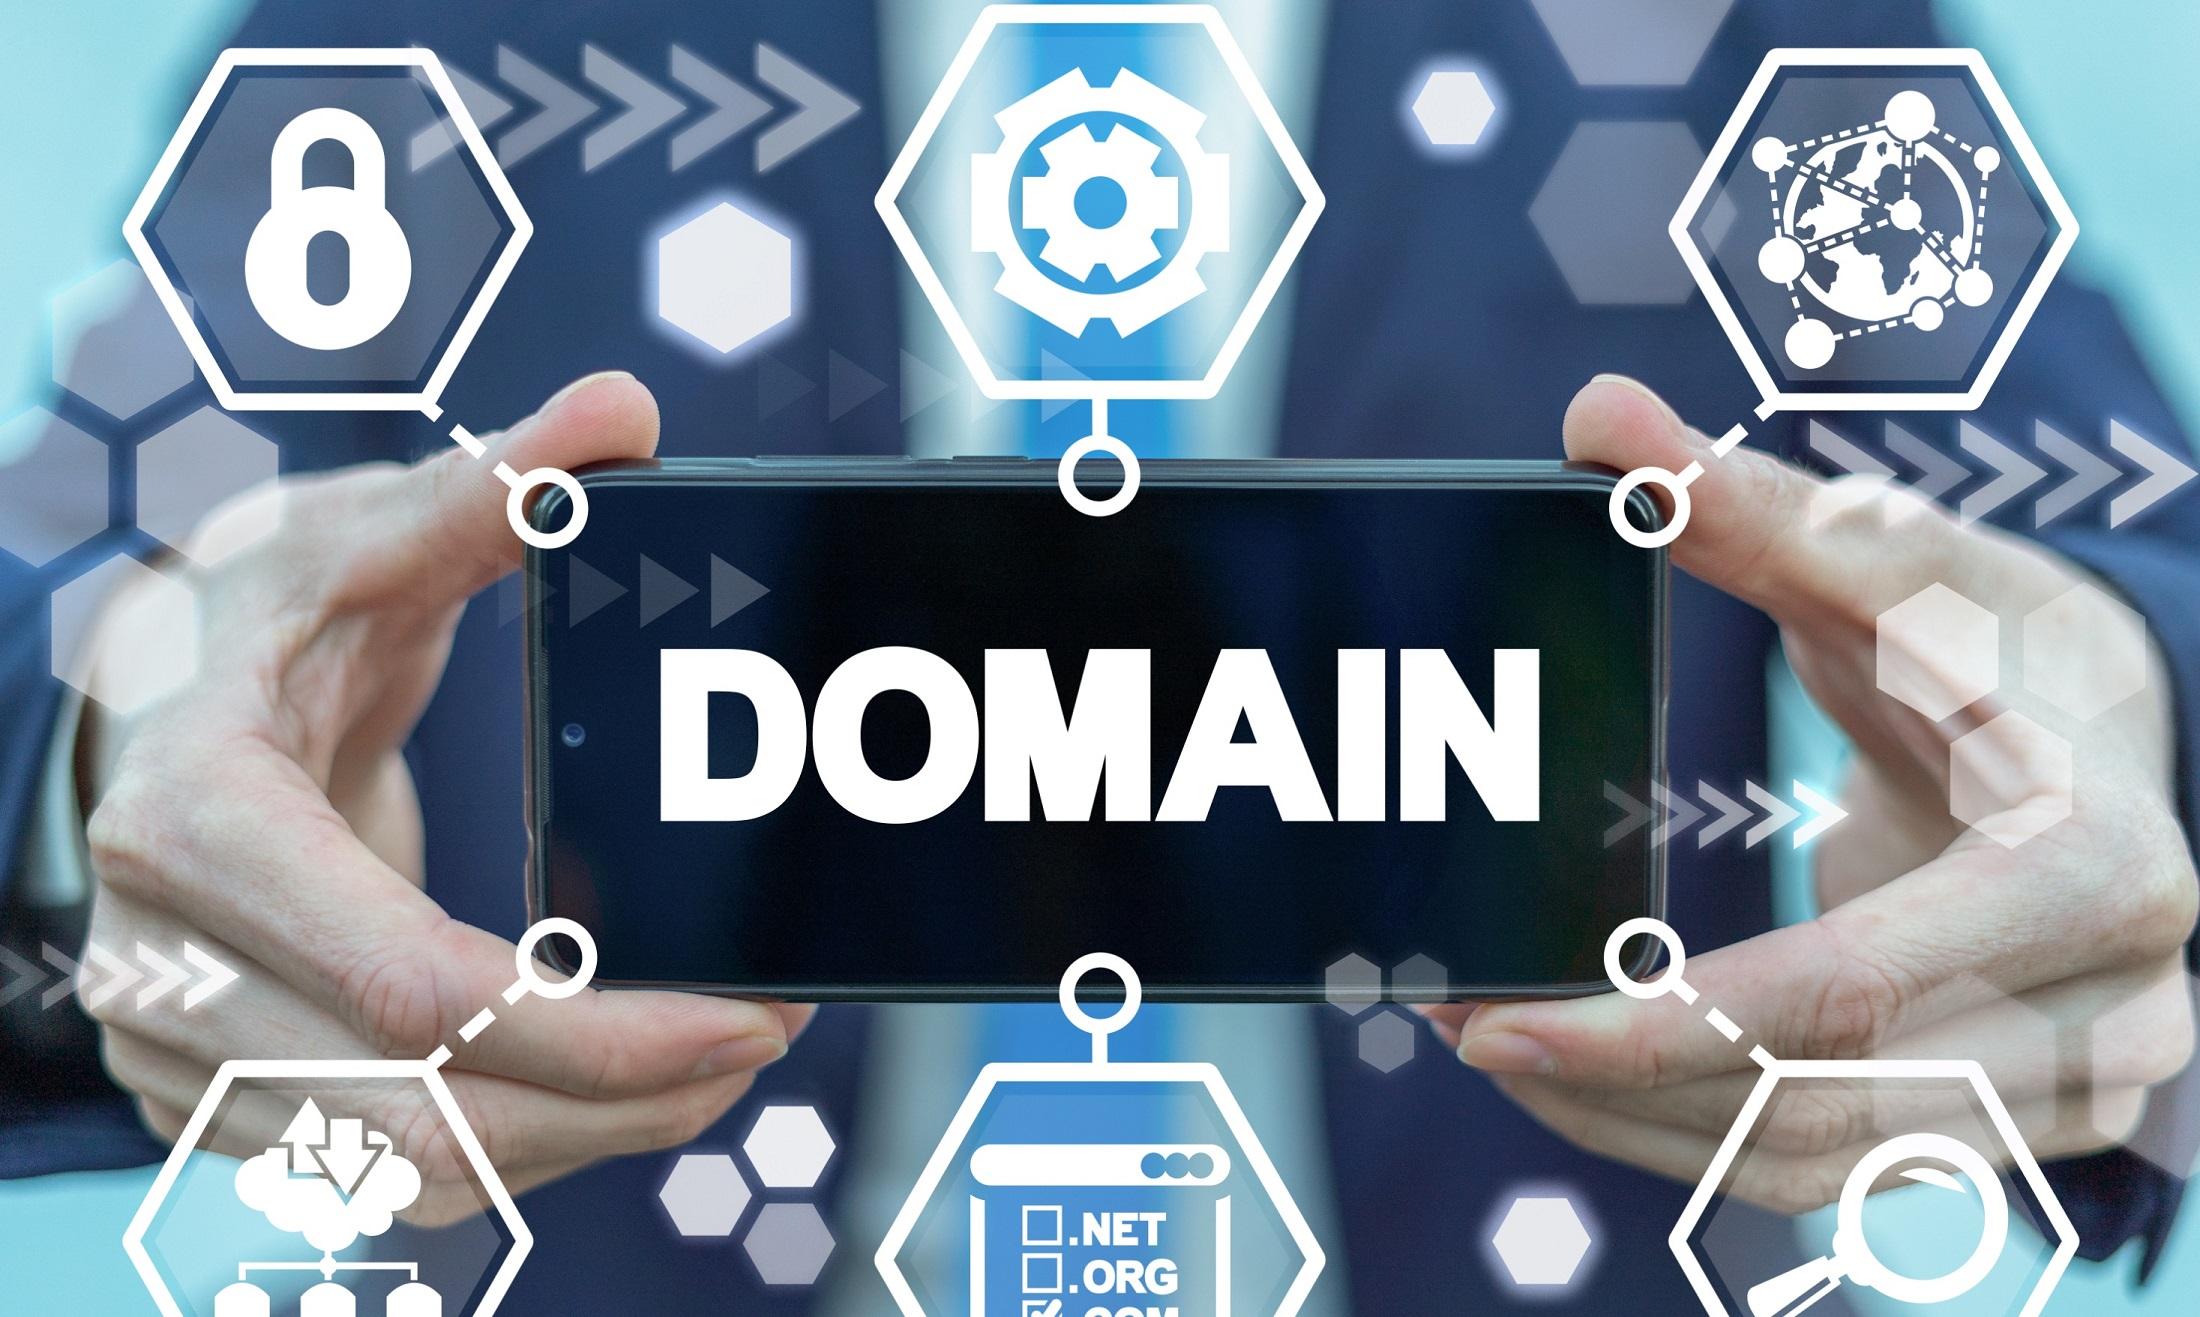 Premium_Domains_For_eCommerce_Websites